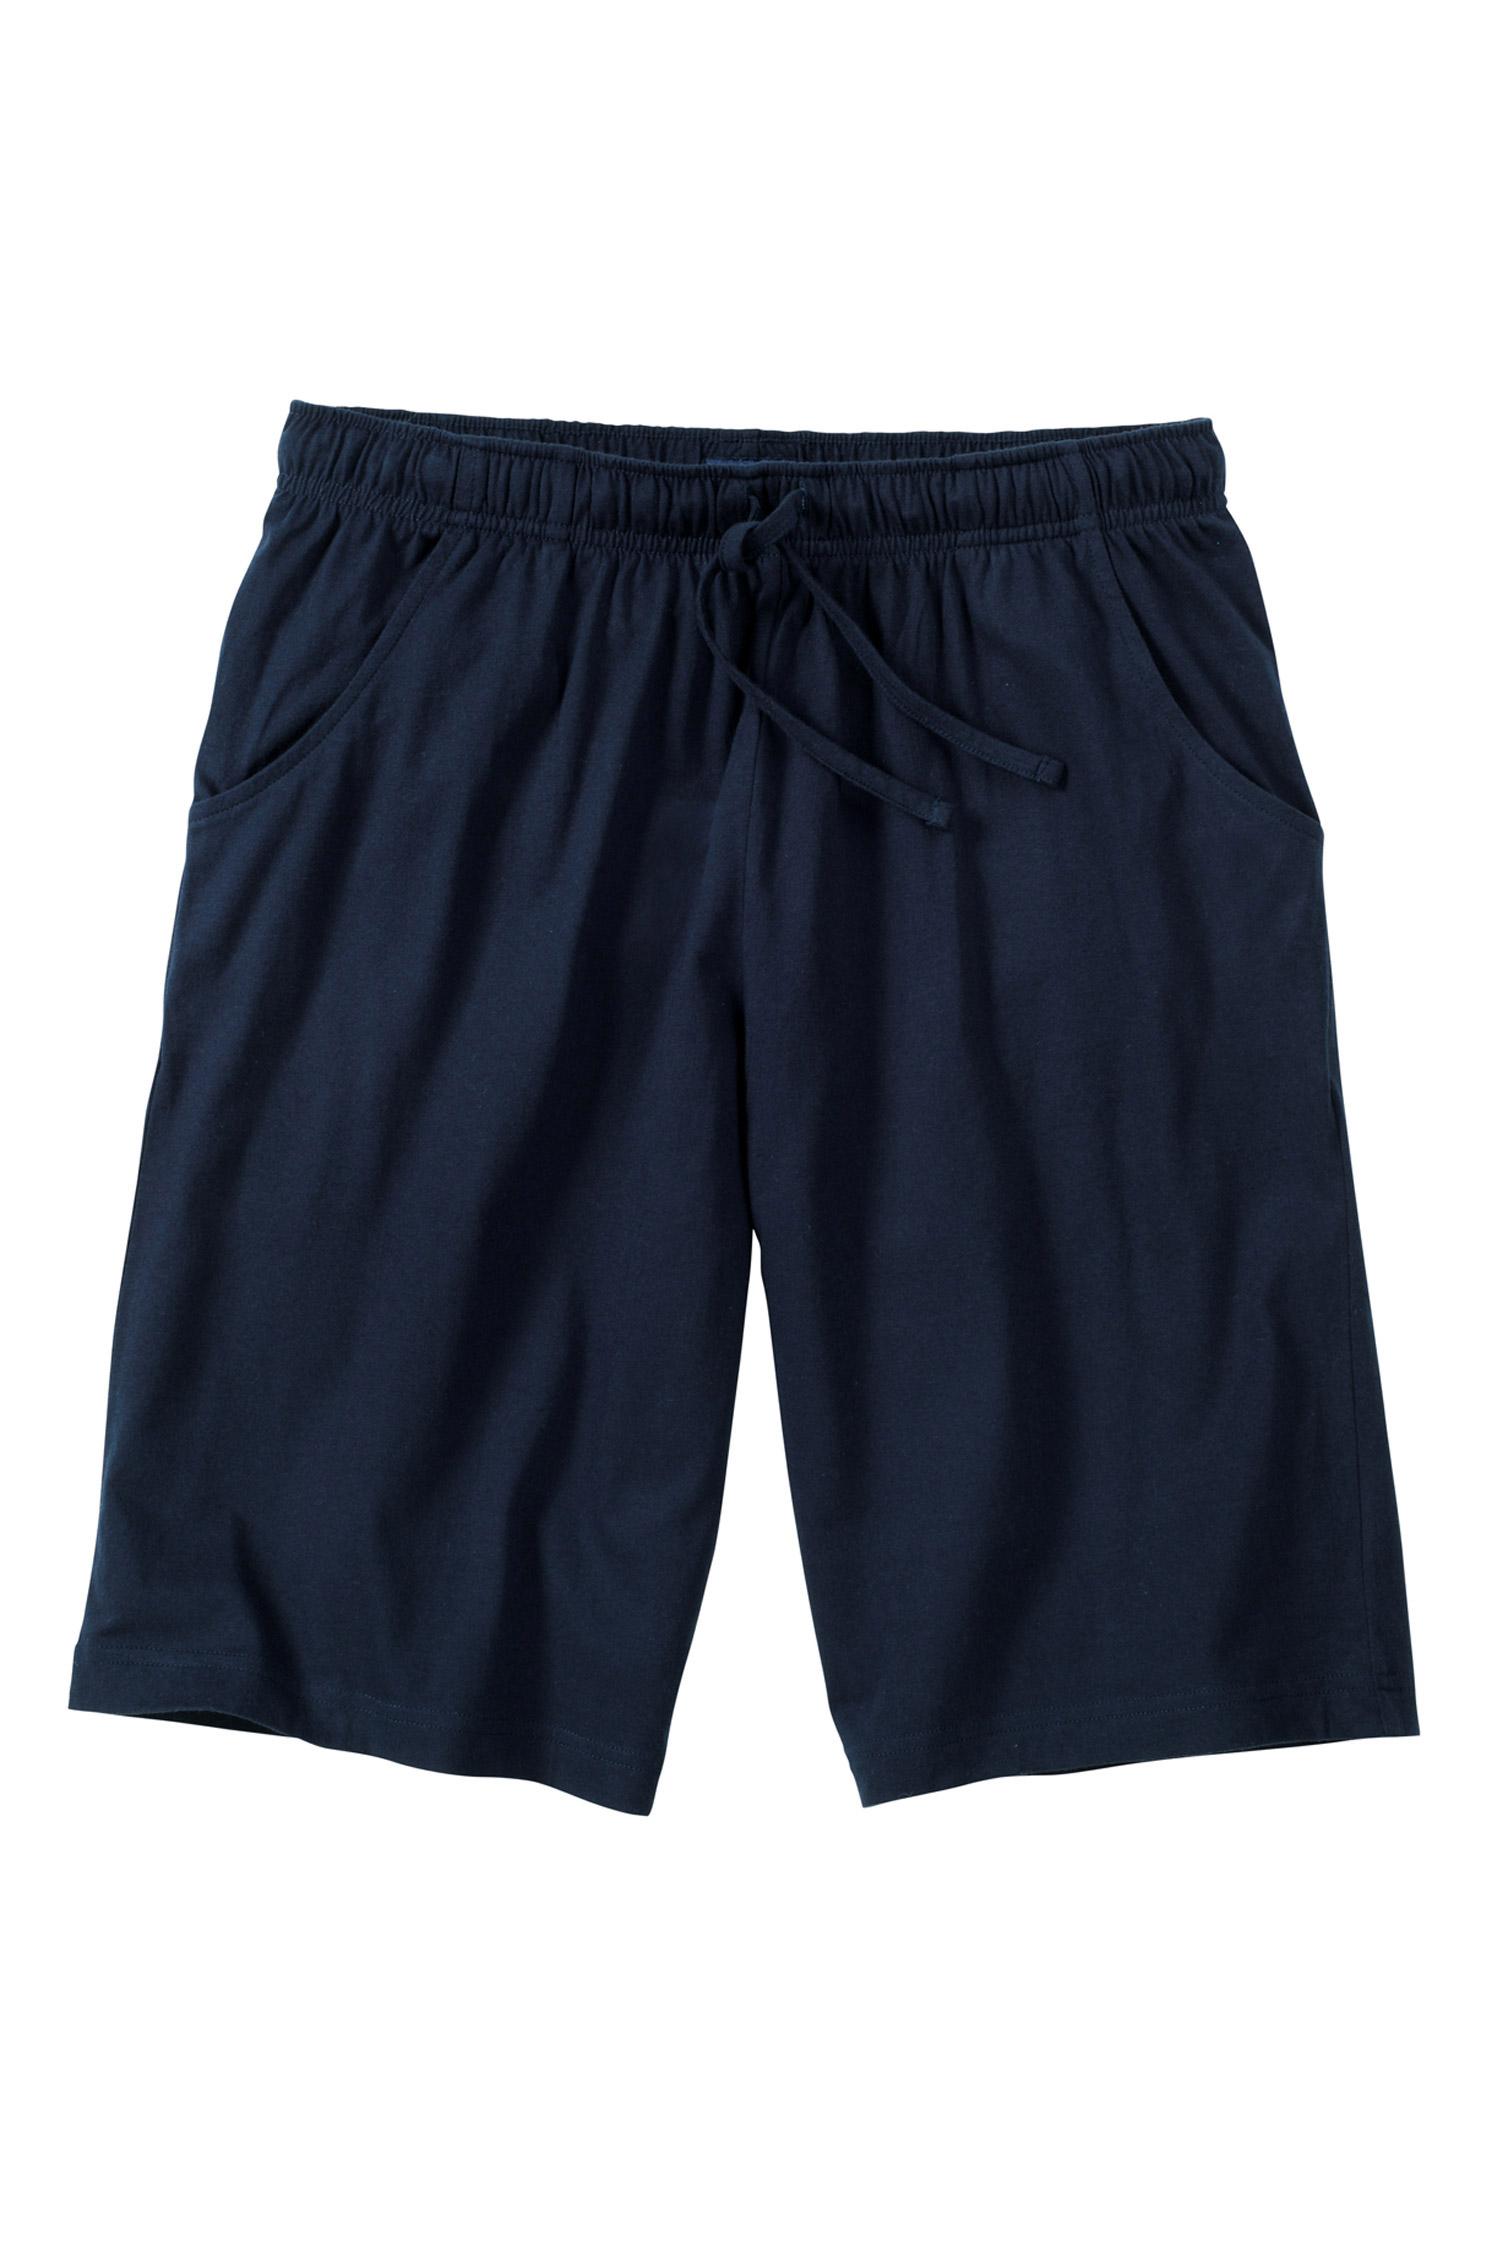 Homewear, Pantalones, 107945, MARINO | Zoom